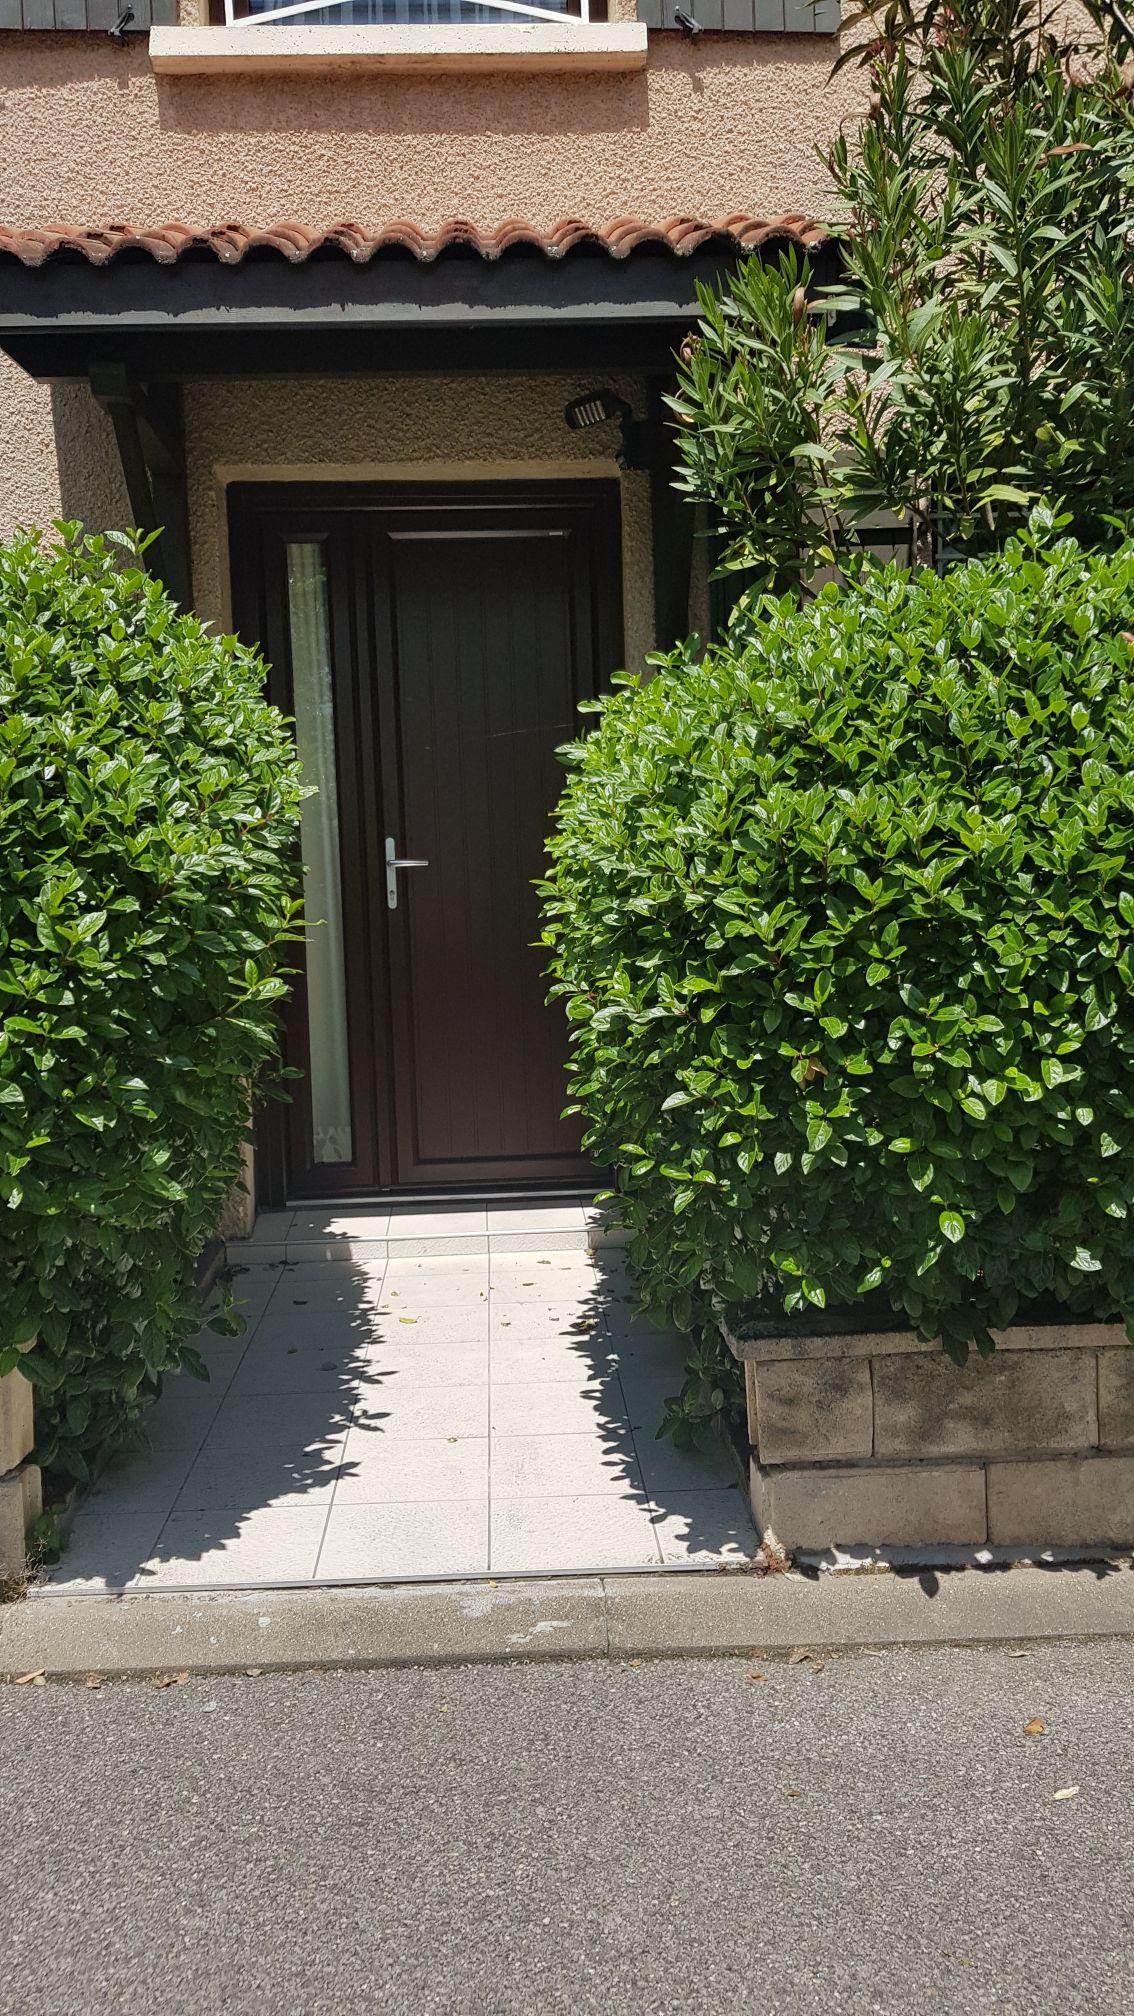 20190528 140517 - GCDH installe une porte d'entrée